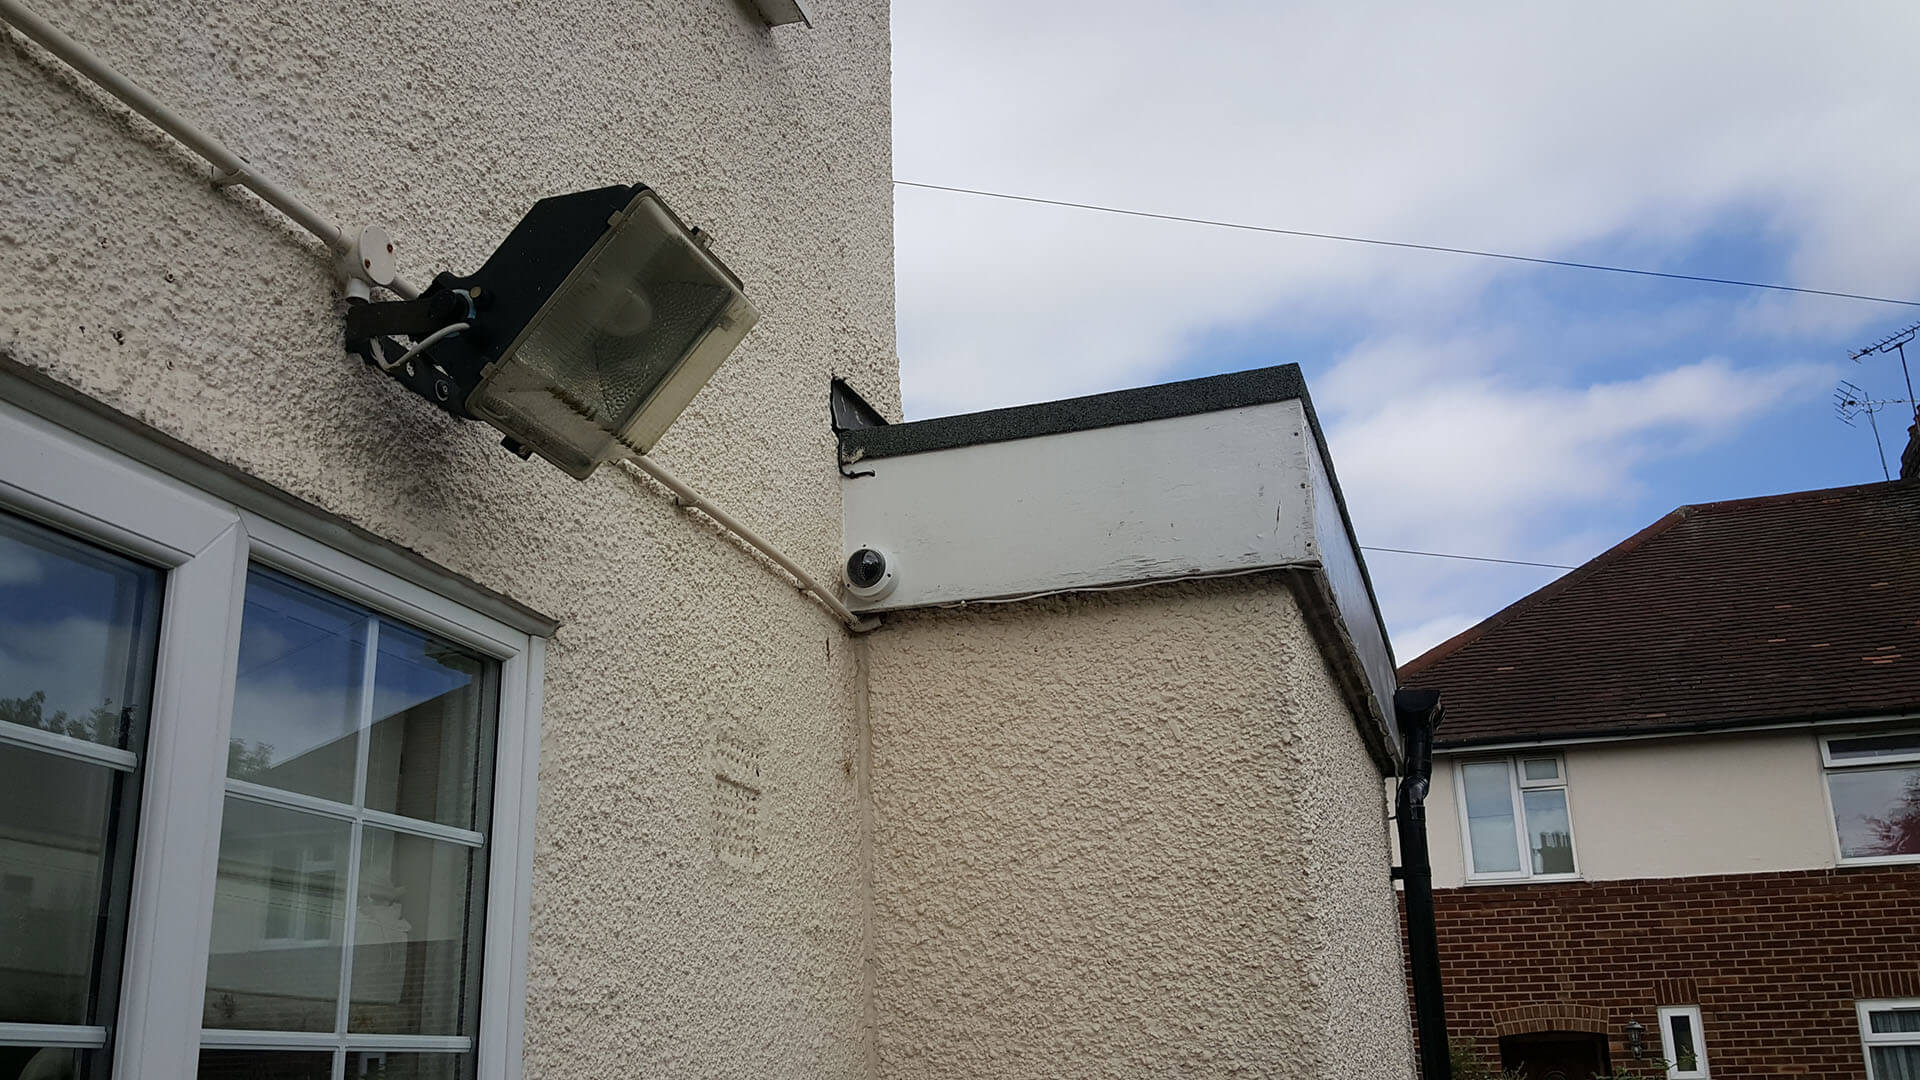 CCTV Installation in Chigwell